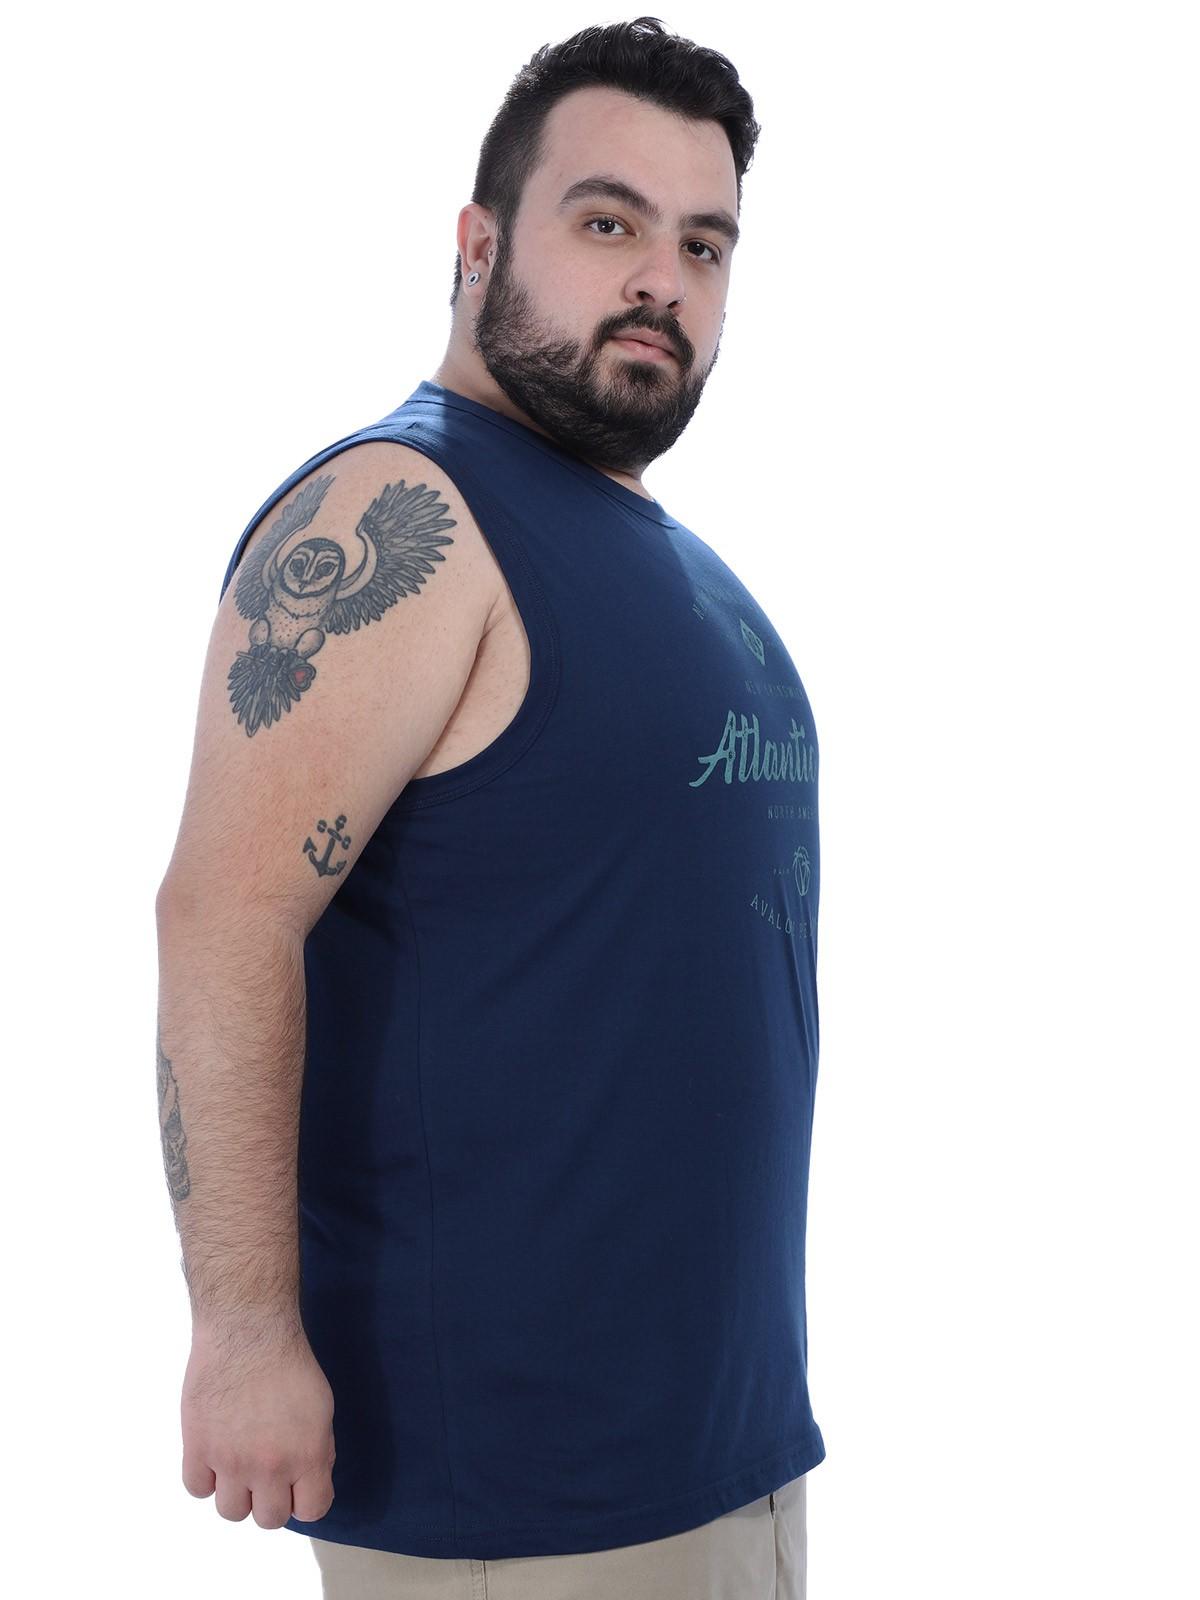 Regata Plus Size Masculina Machão Atlantic Anistia Azul Marinho